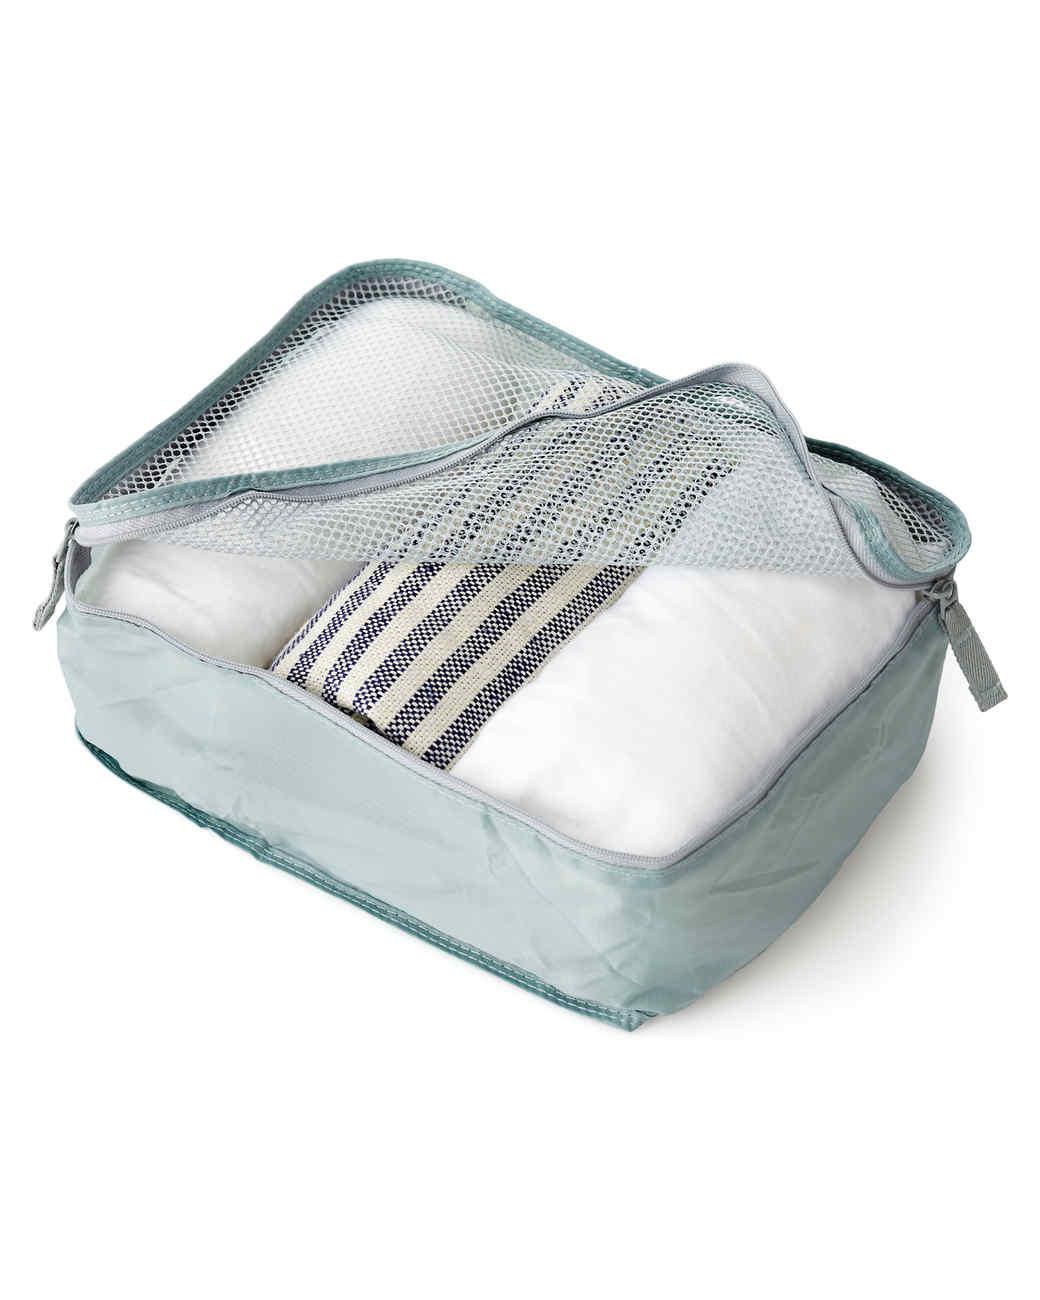 on-the-road-muji-garment-bag-mld108874.jpg